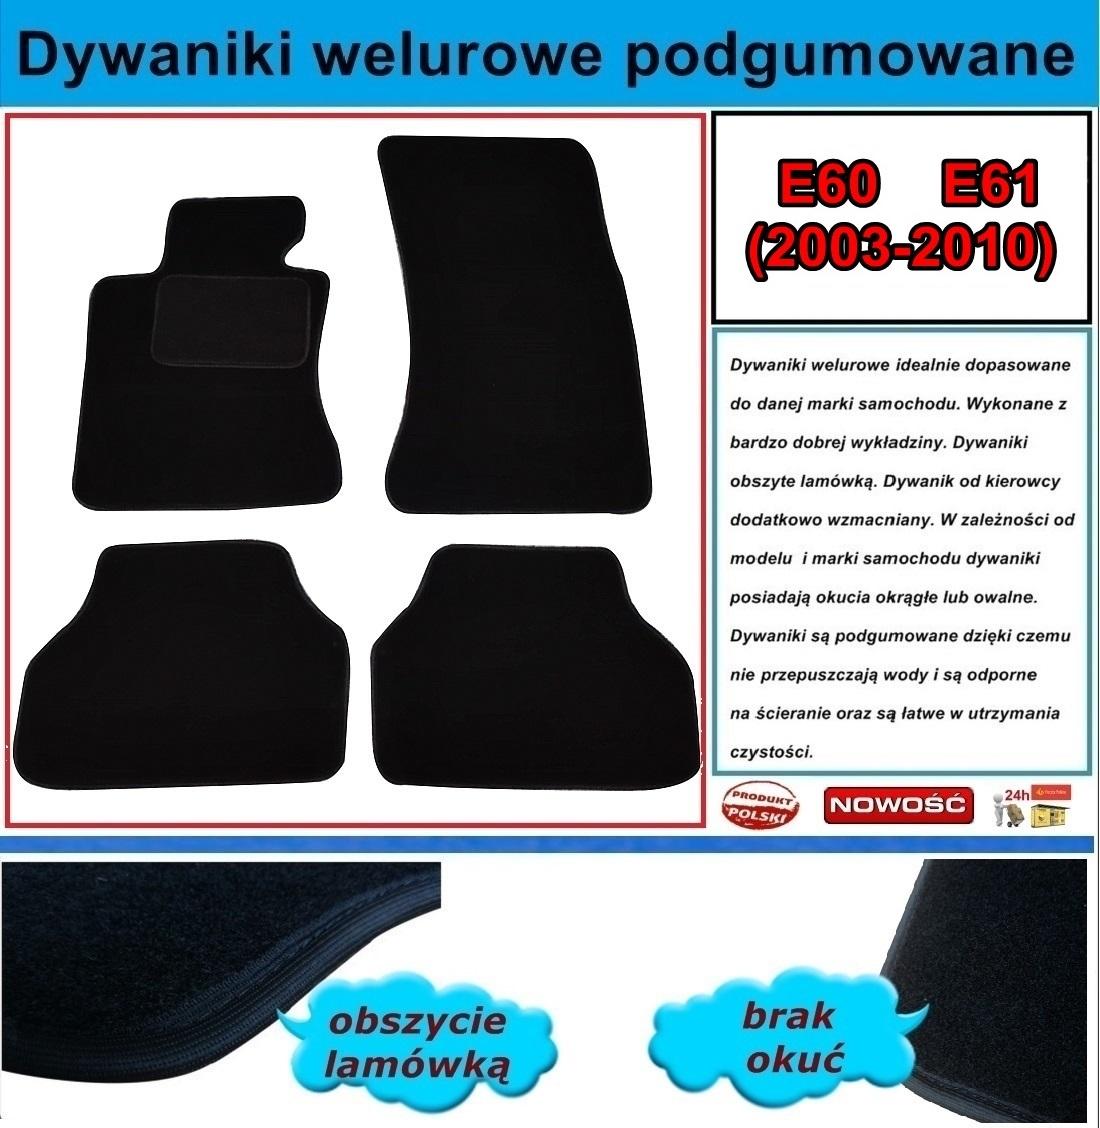 http://sklep.trio.com.pl/galerie/d/dywaniki-welurowe-do-samochod_27823.jpg